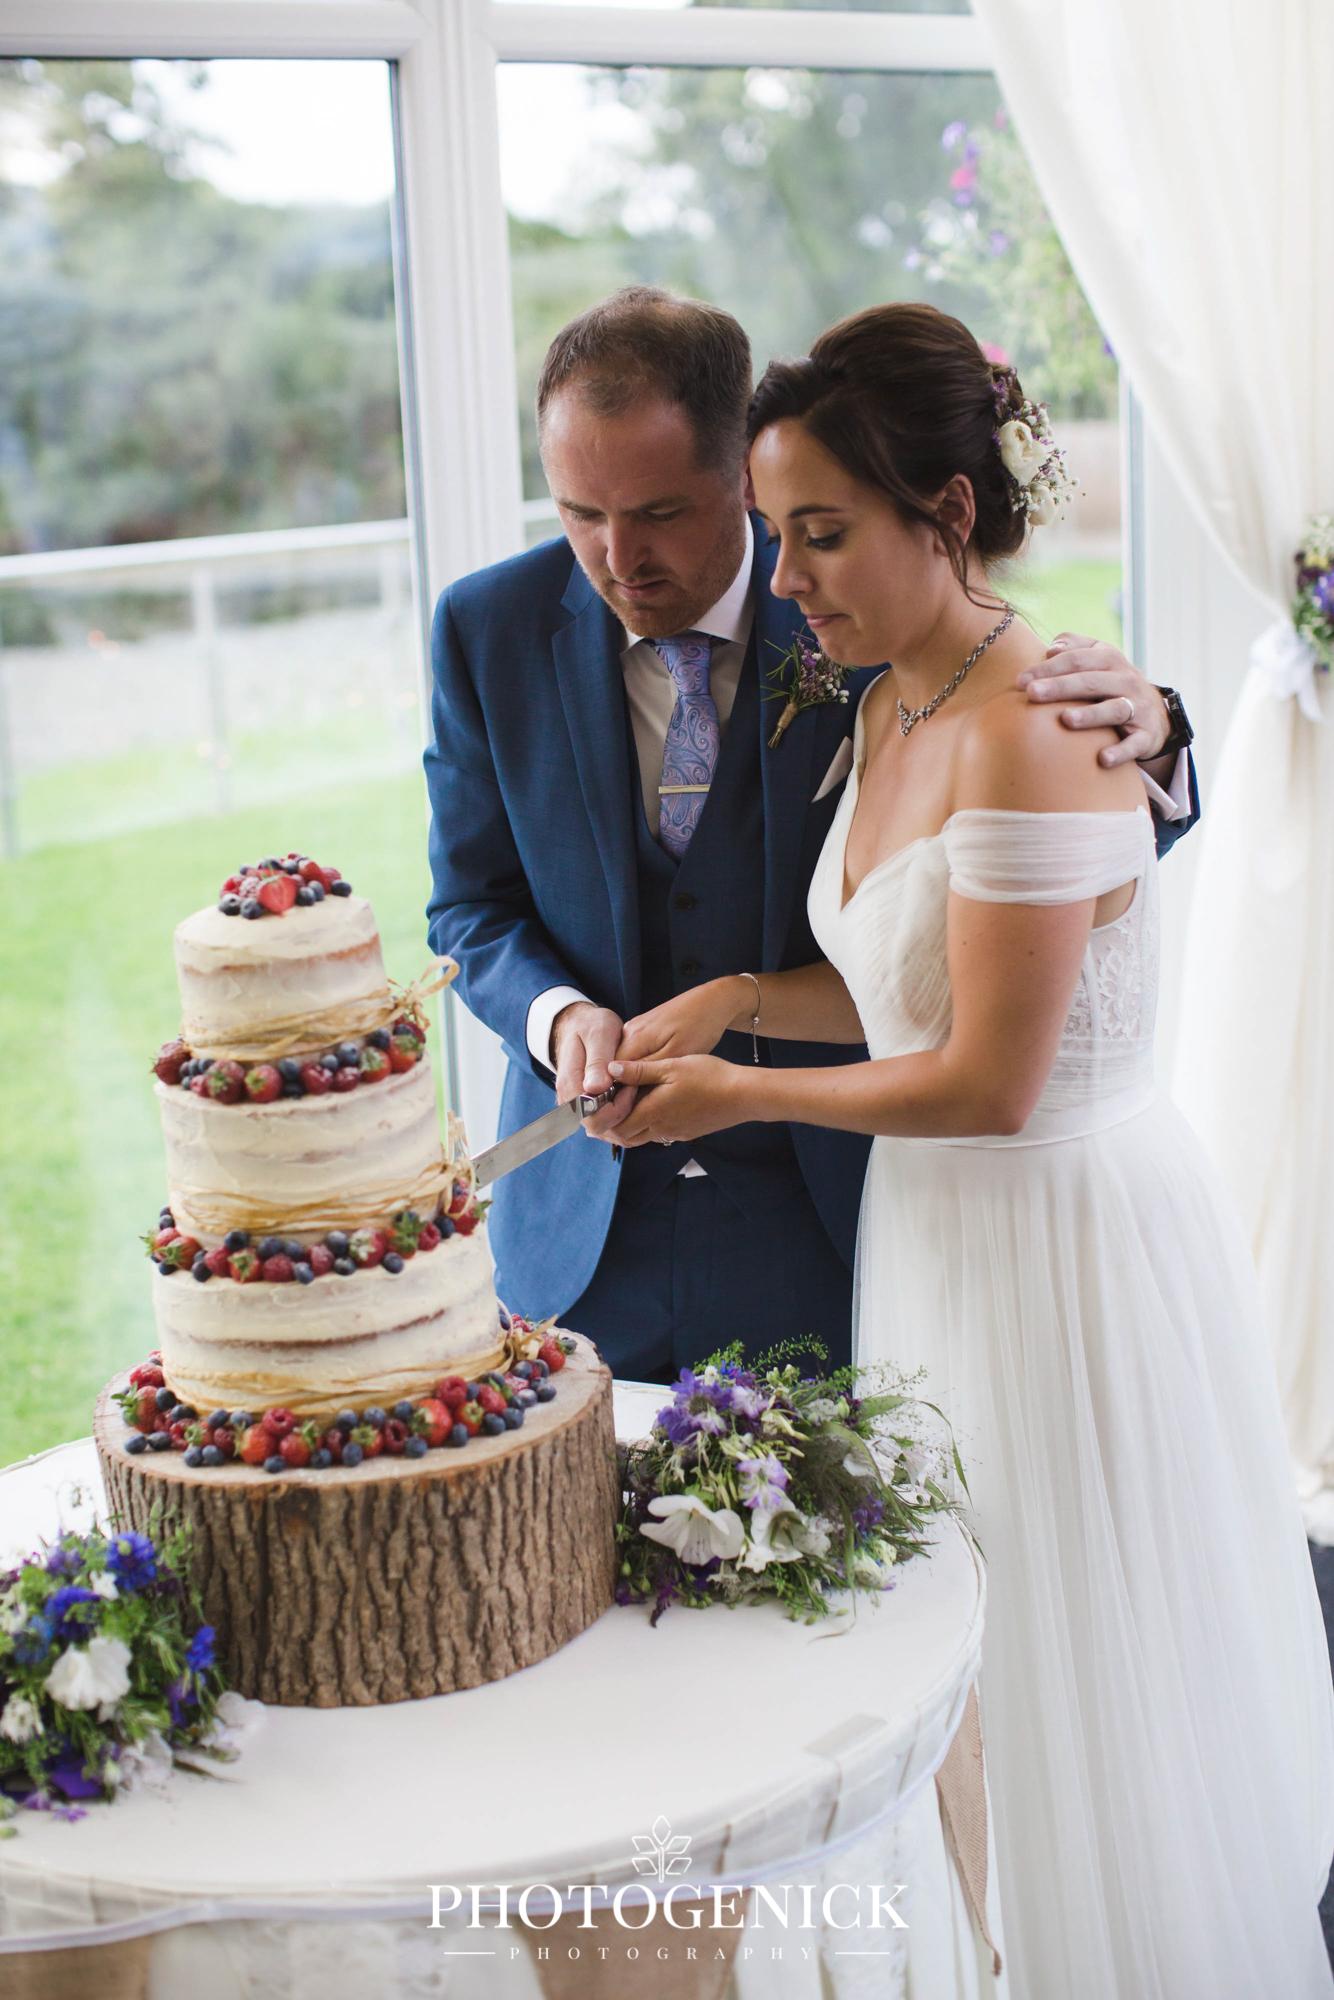 oldwalls gower wedding photographers-62.jpg